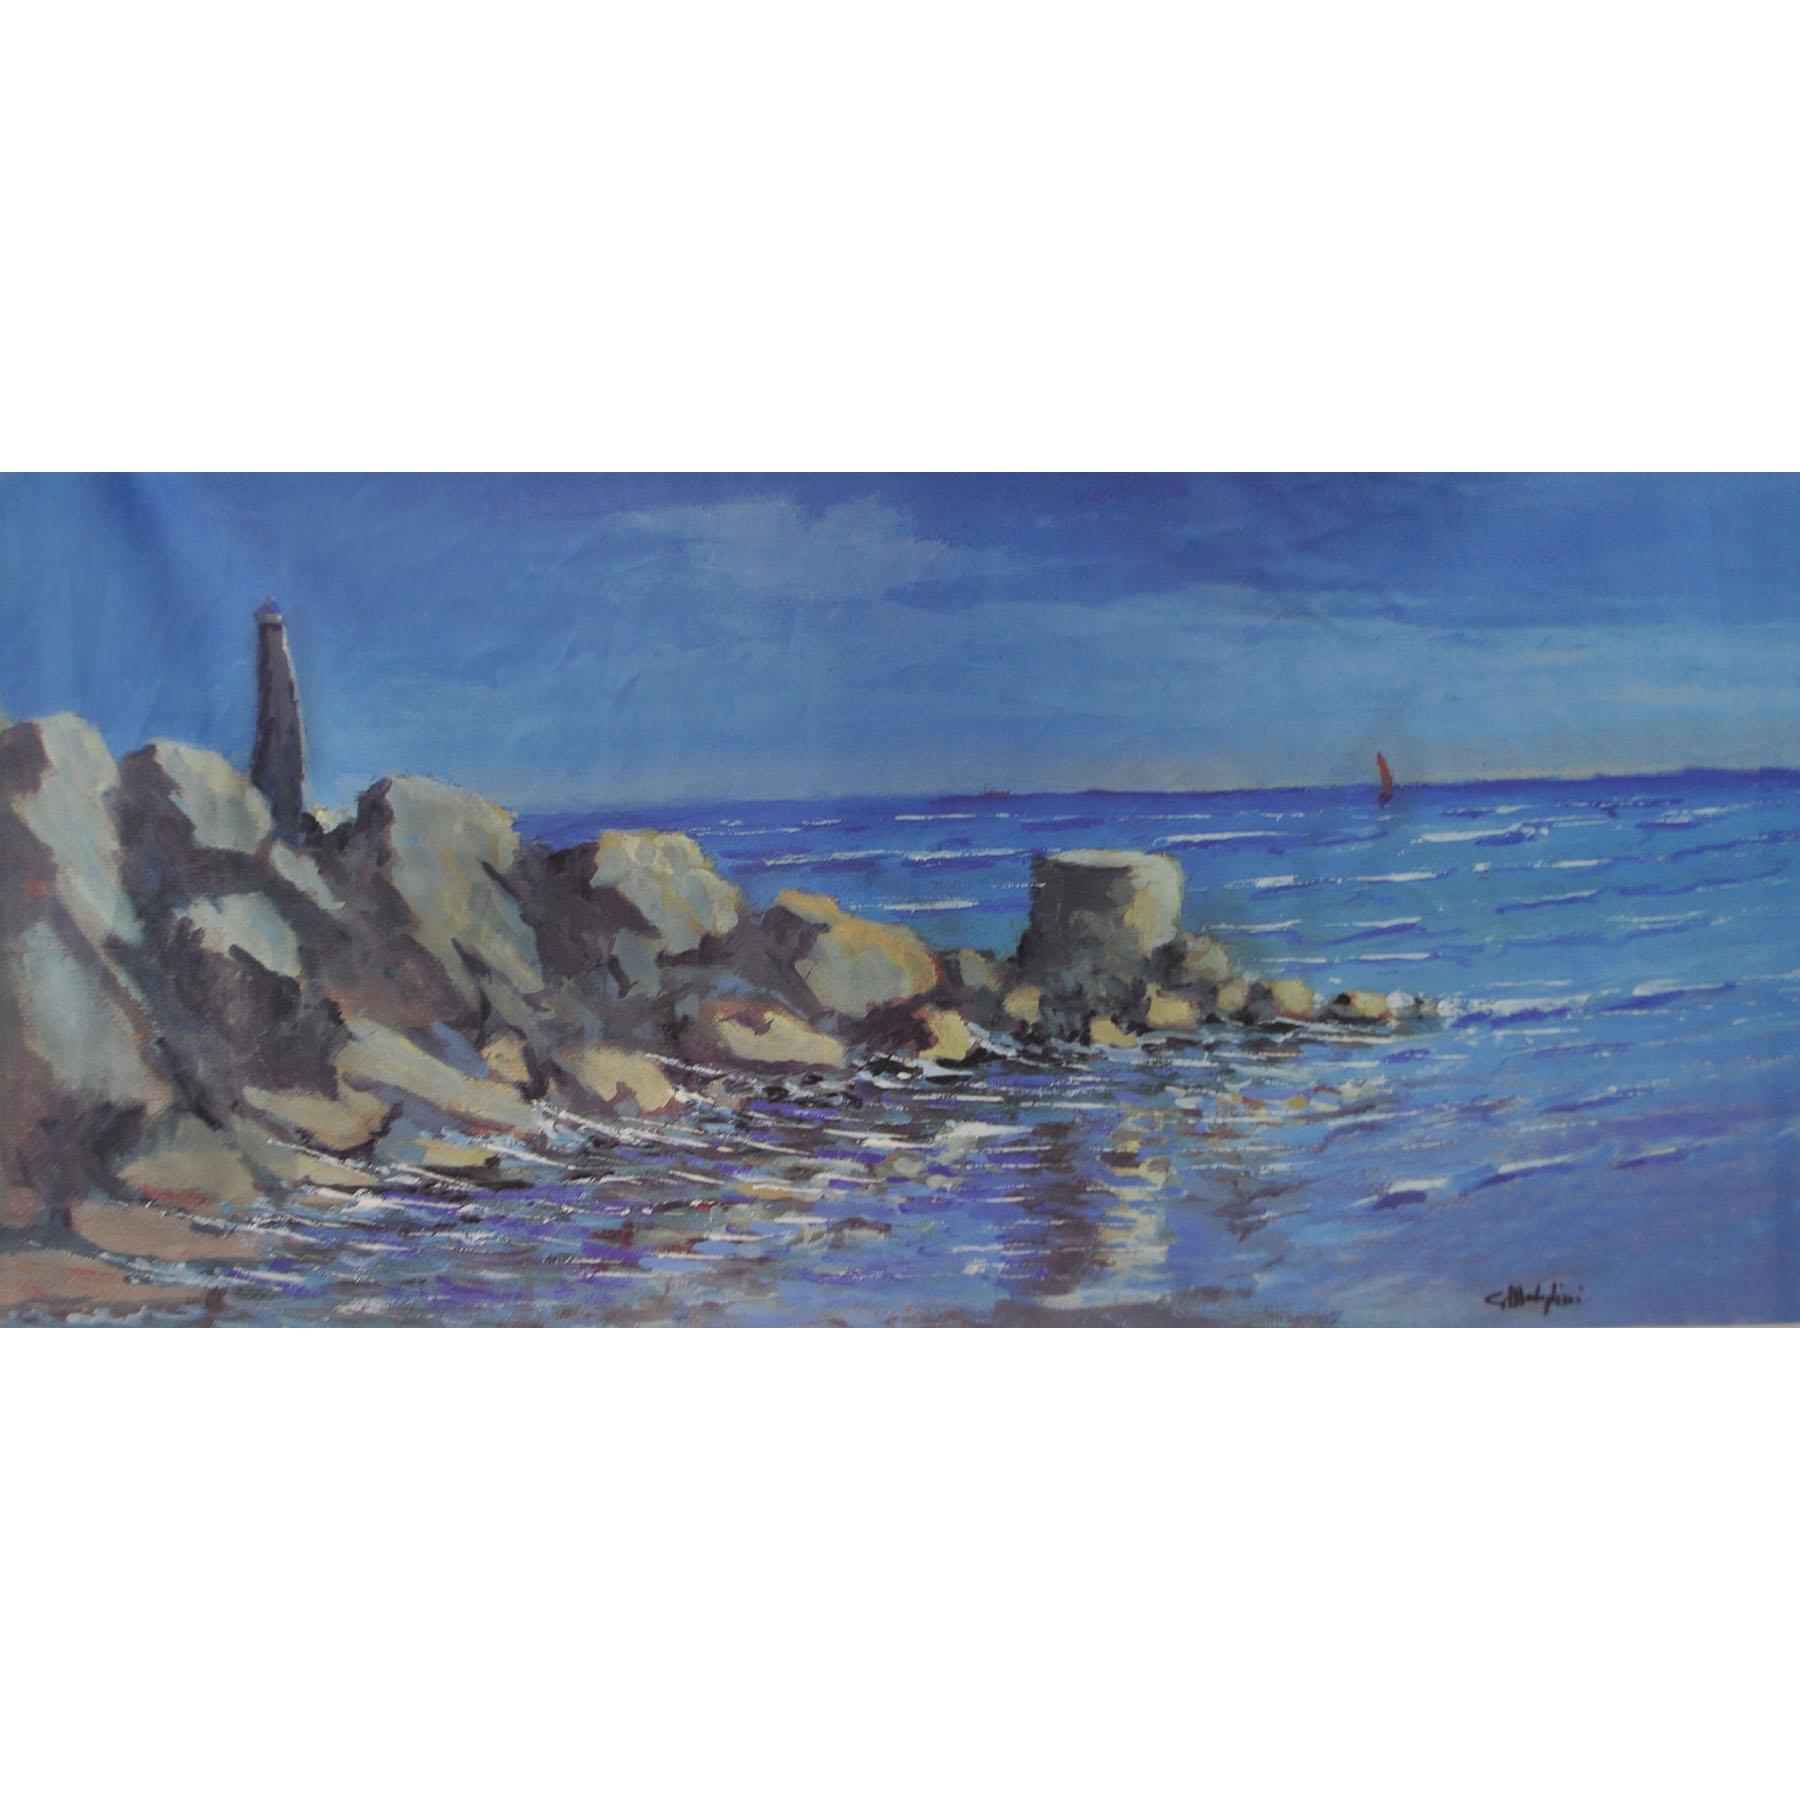 Maler Panneaux 156 x 79 cm  - Medaglini